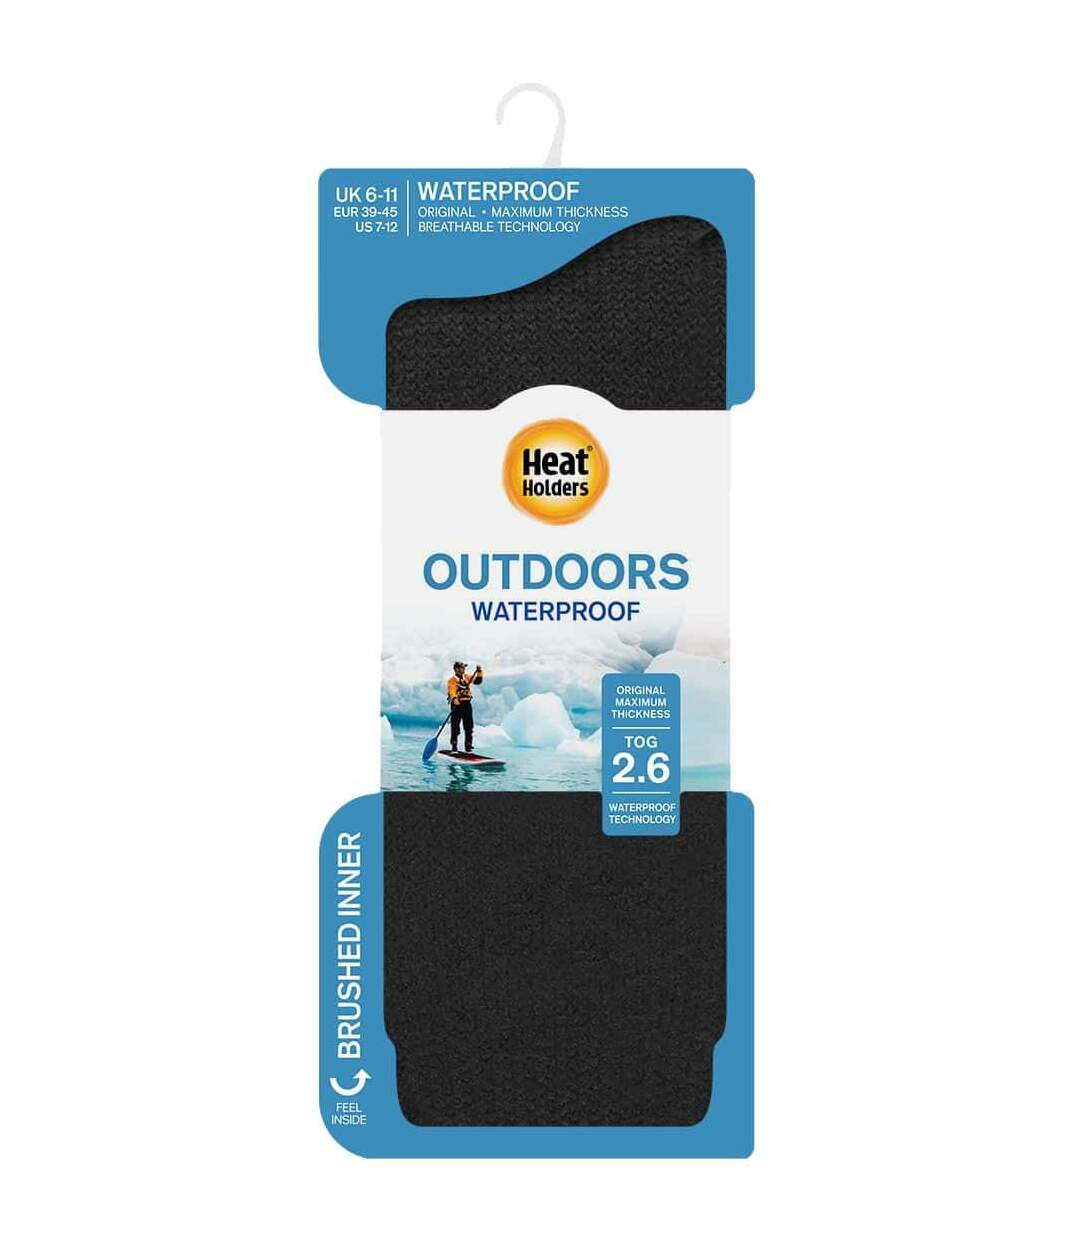 Soft Fleece Waterproof Base Picnic Blanket in Bag